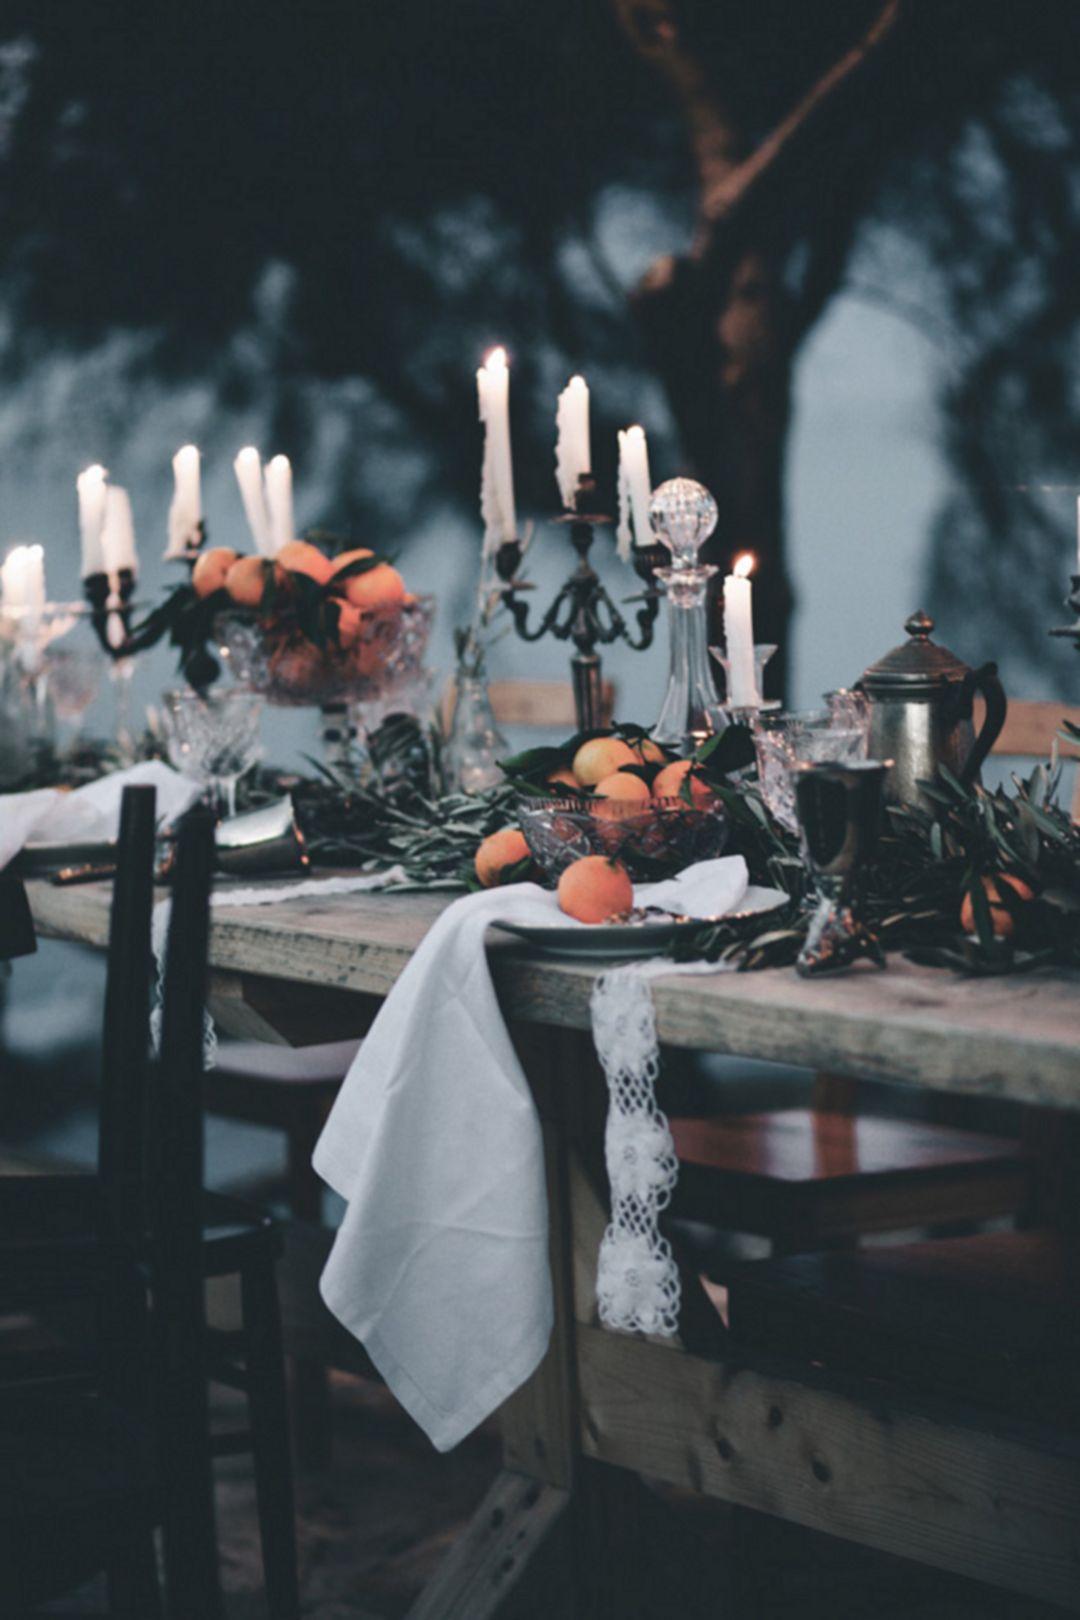 20 Best Pinterest Halloween Party Ideas